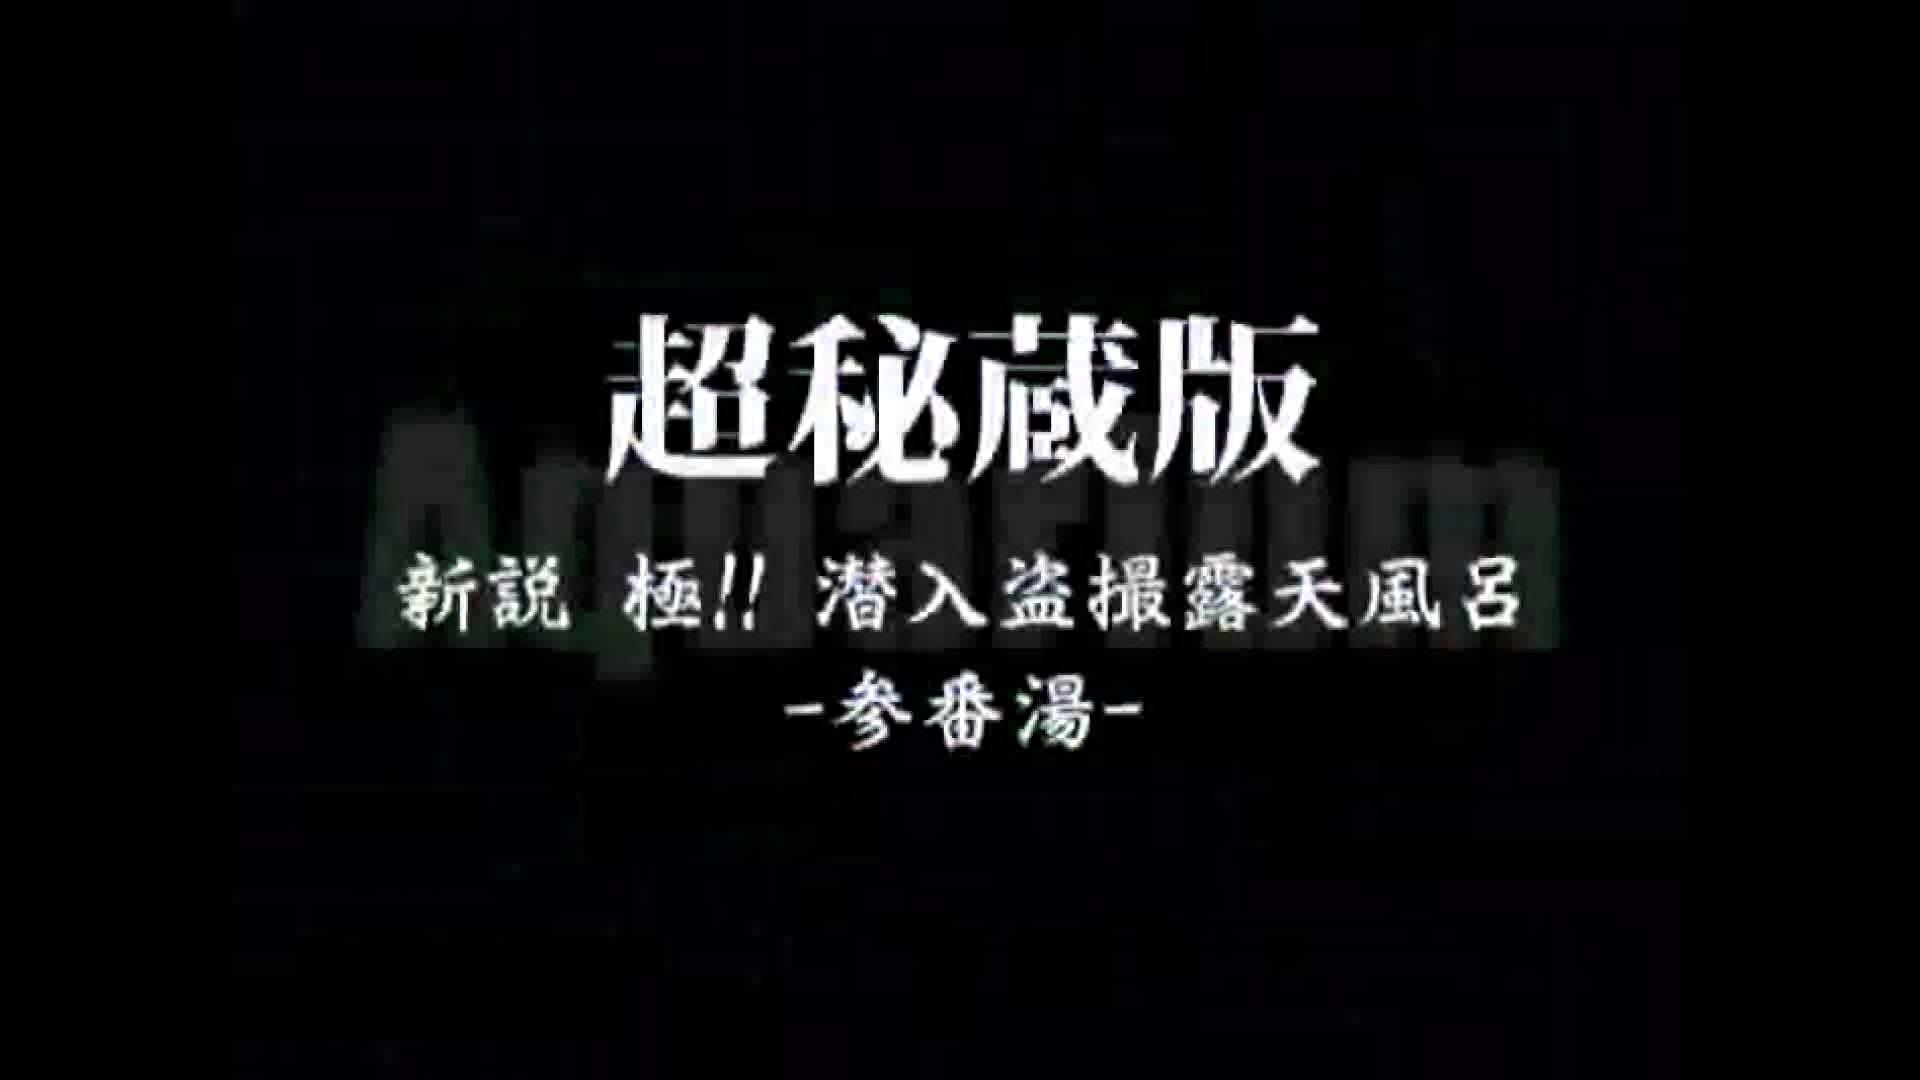 Aquaな露天風呂Vol.867潜入盗撮露天風呂参判湯 其の七 潜入 覗き性交動画流出 83連発 3